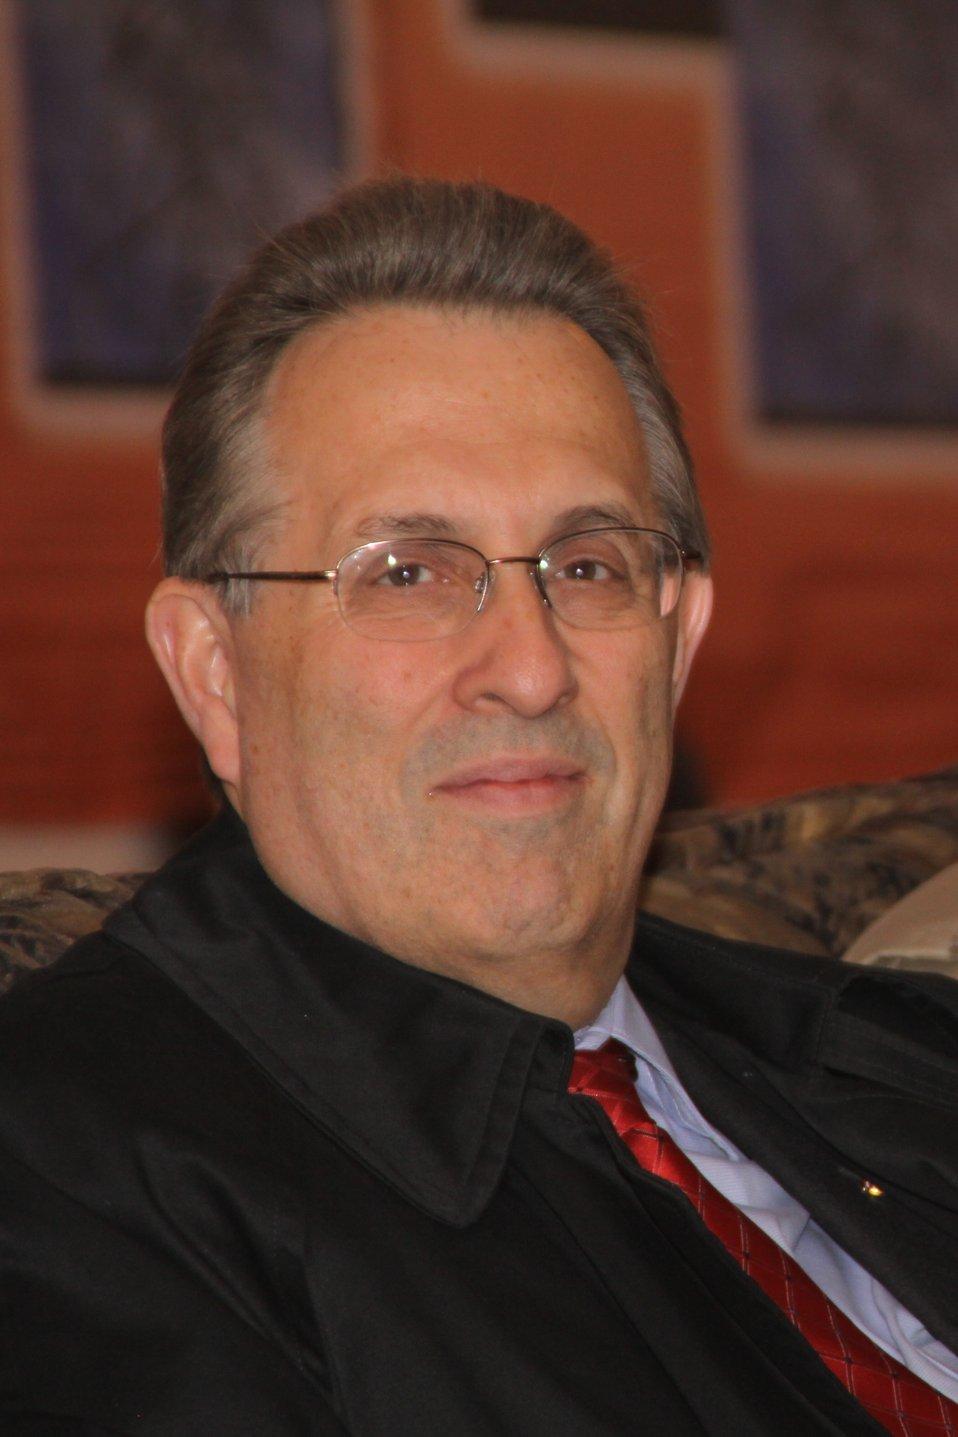 U.S. Ambassador E. Anthony Wayne